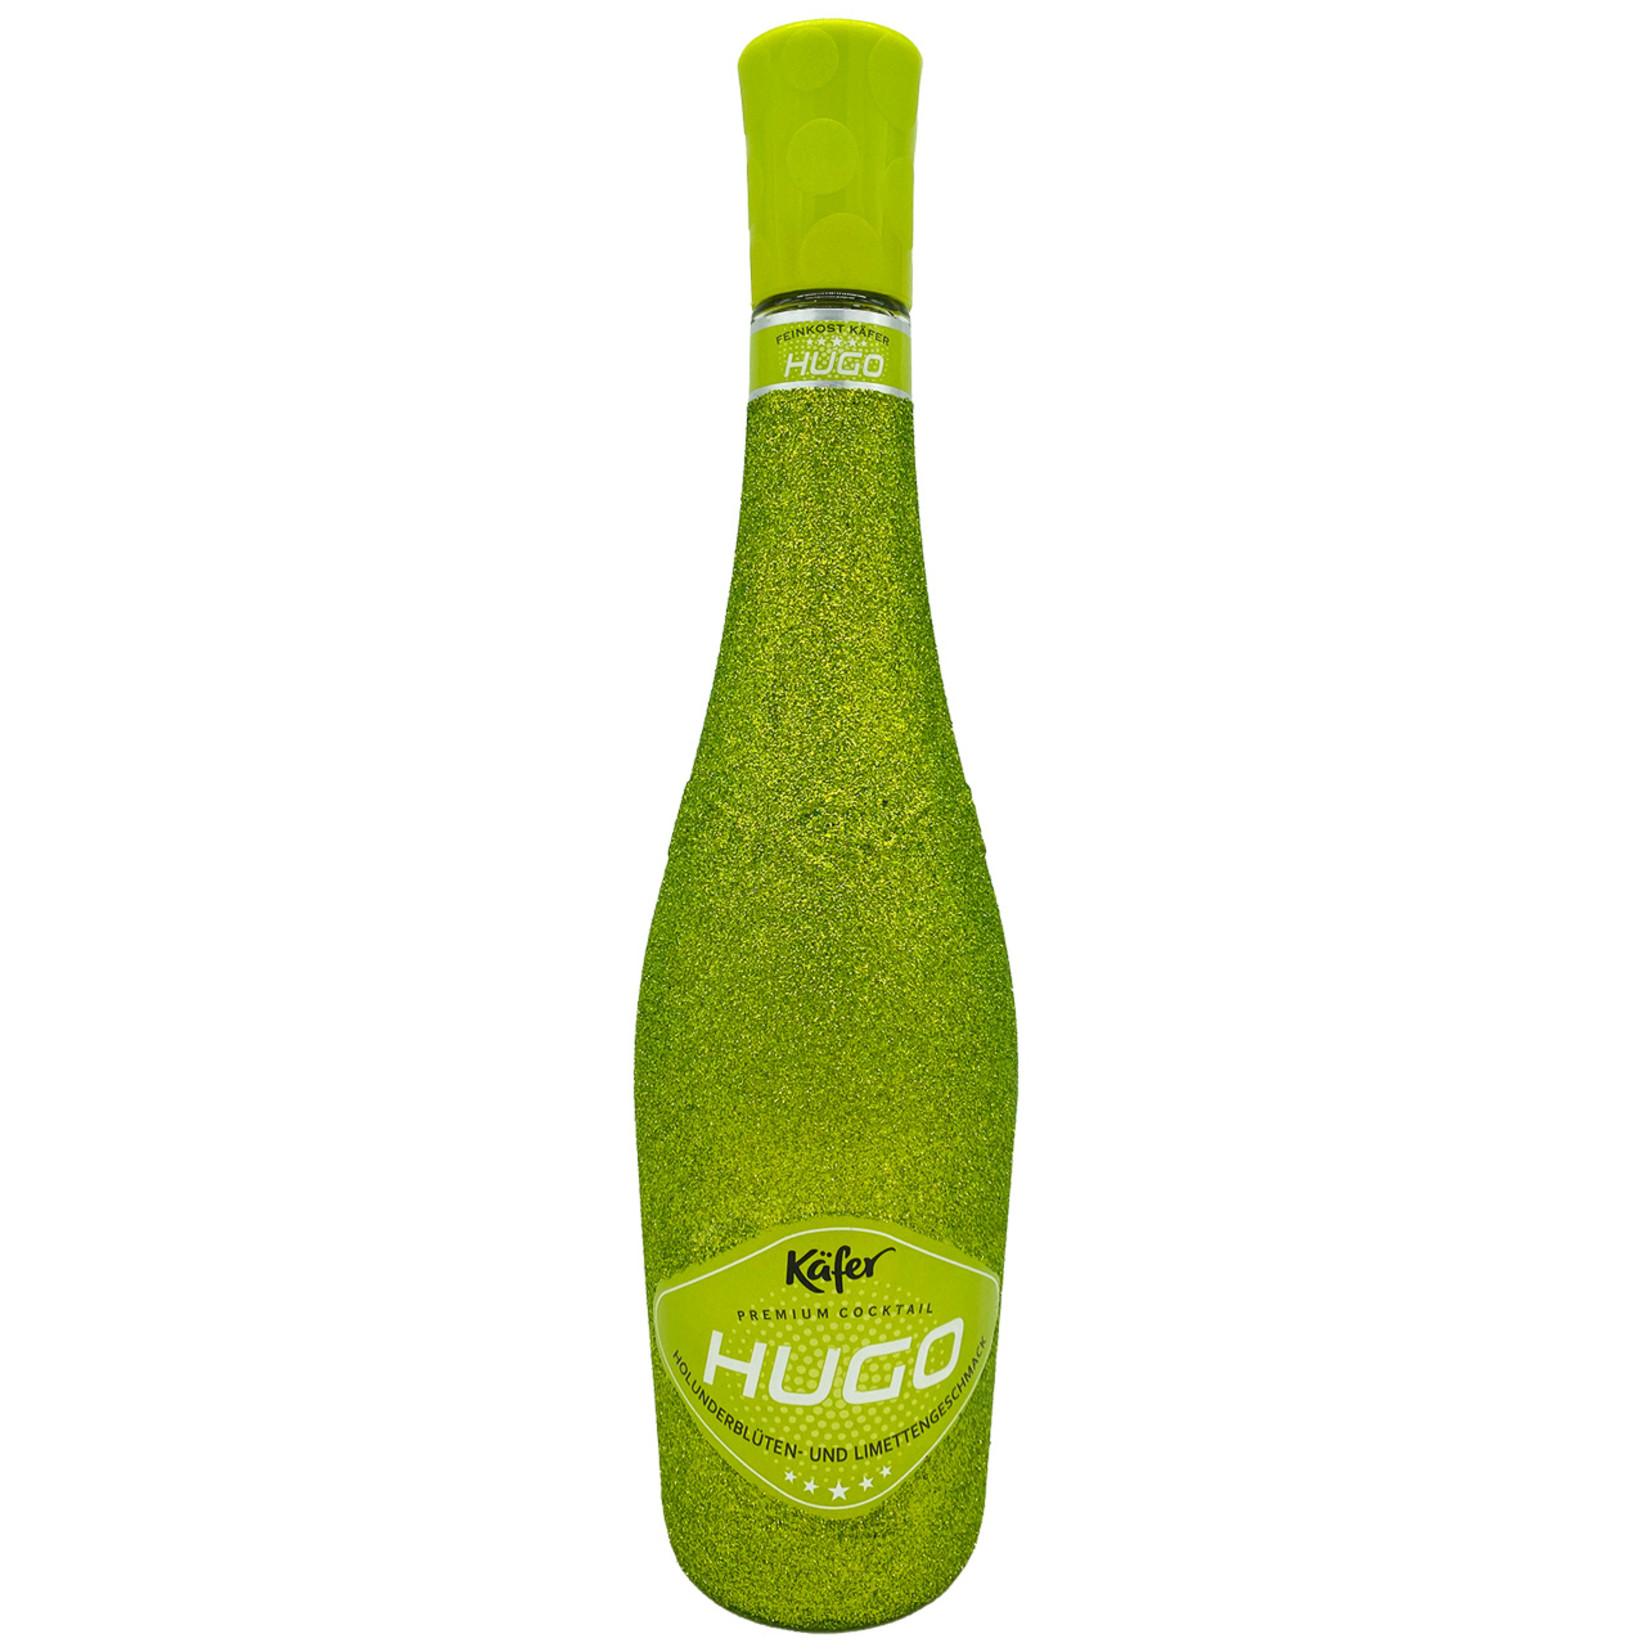 Champagner & Secco Glitzer Feinkost Käfer Hugo Holunderblüte (0,75l)